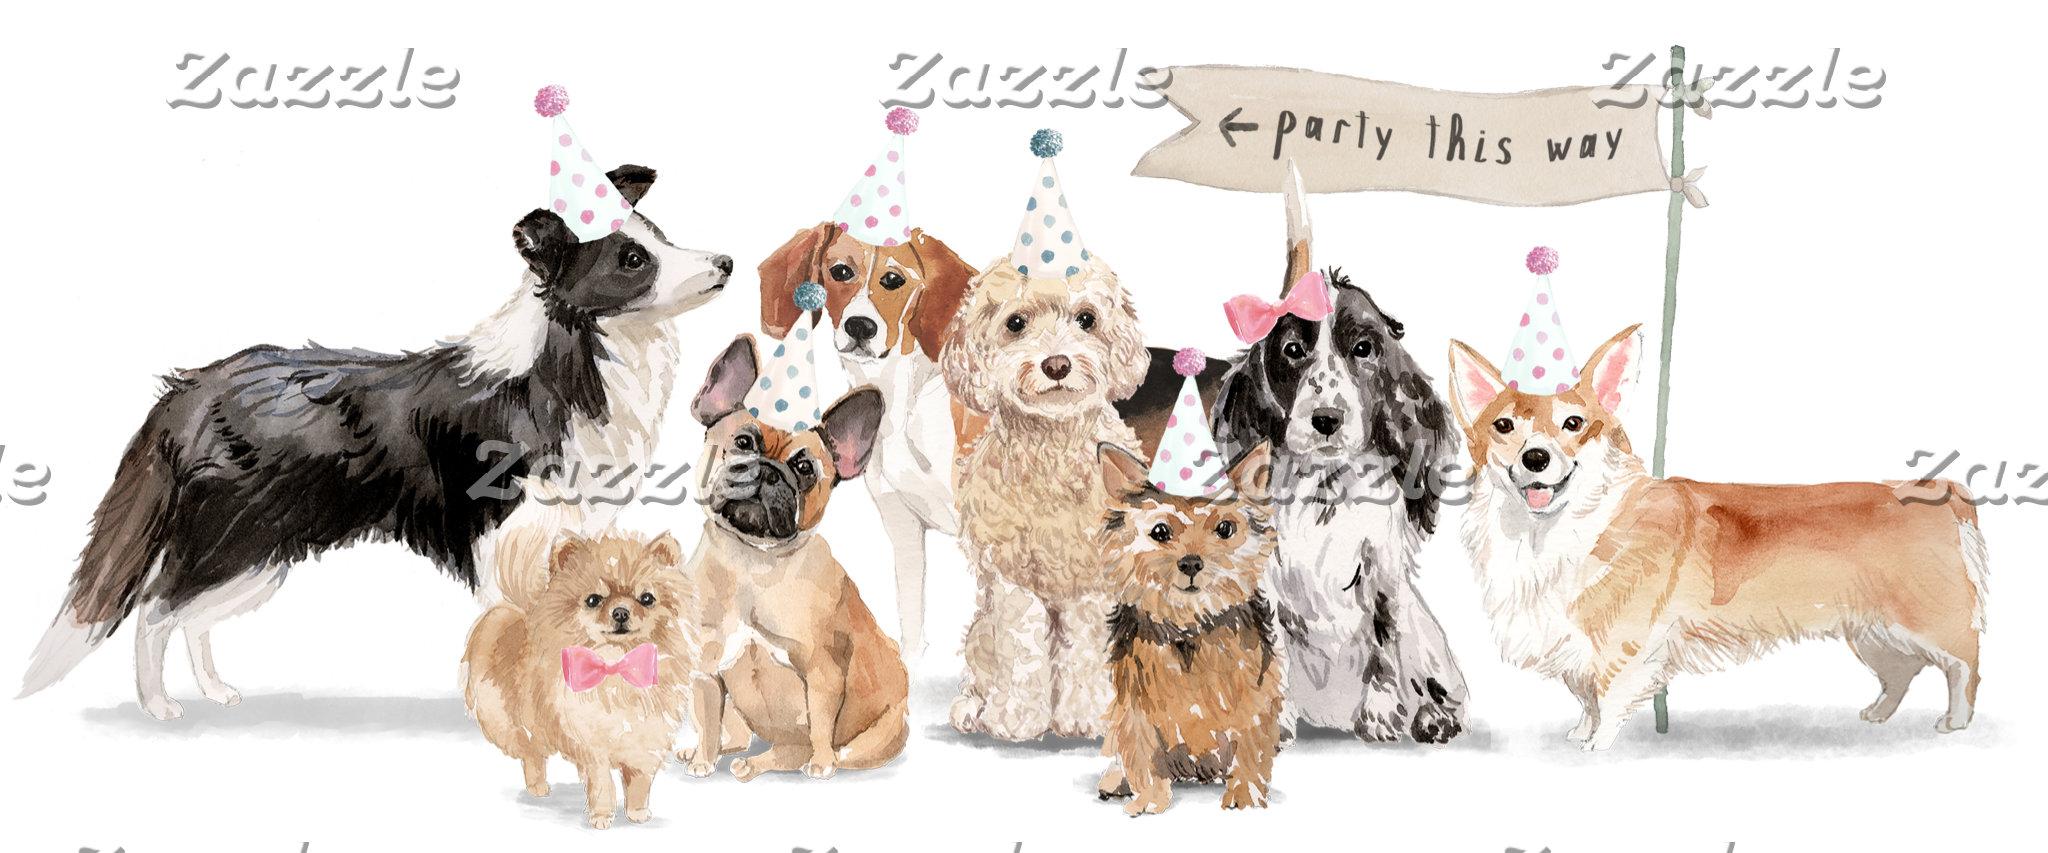 Dog Party Illustration